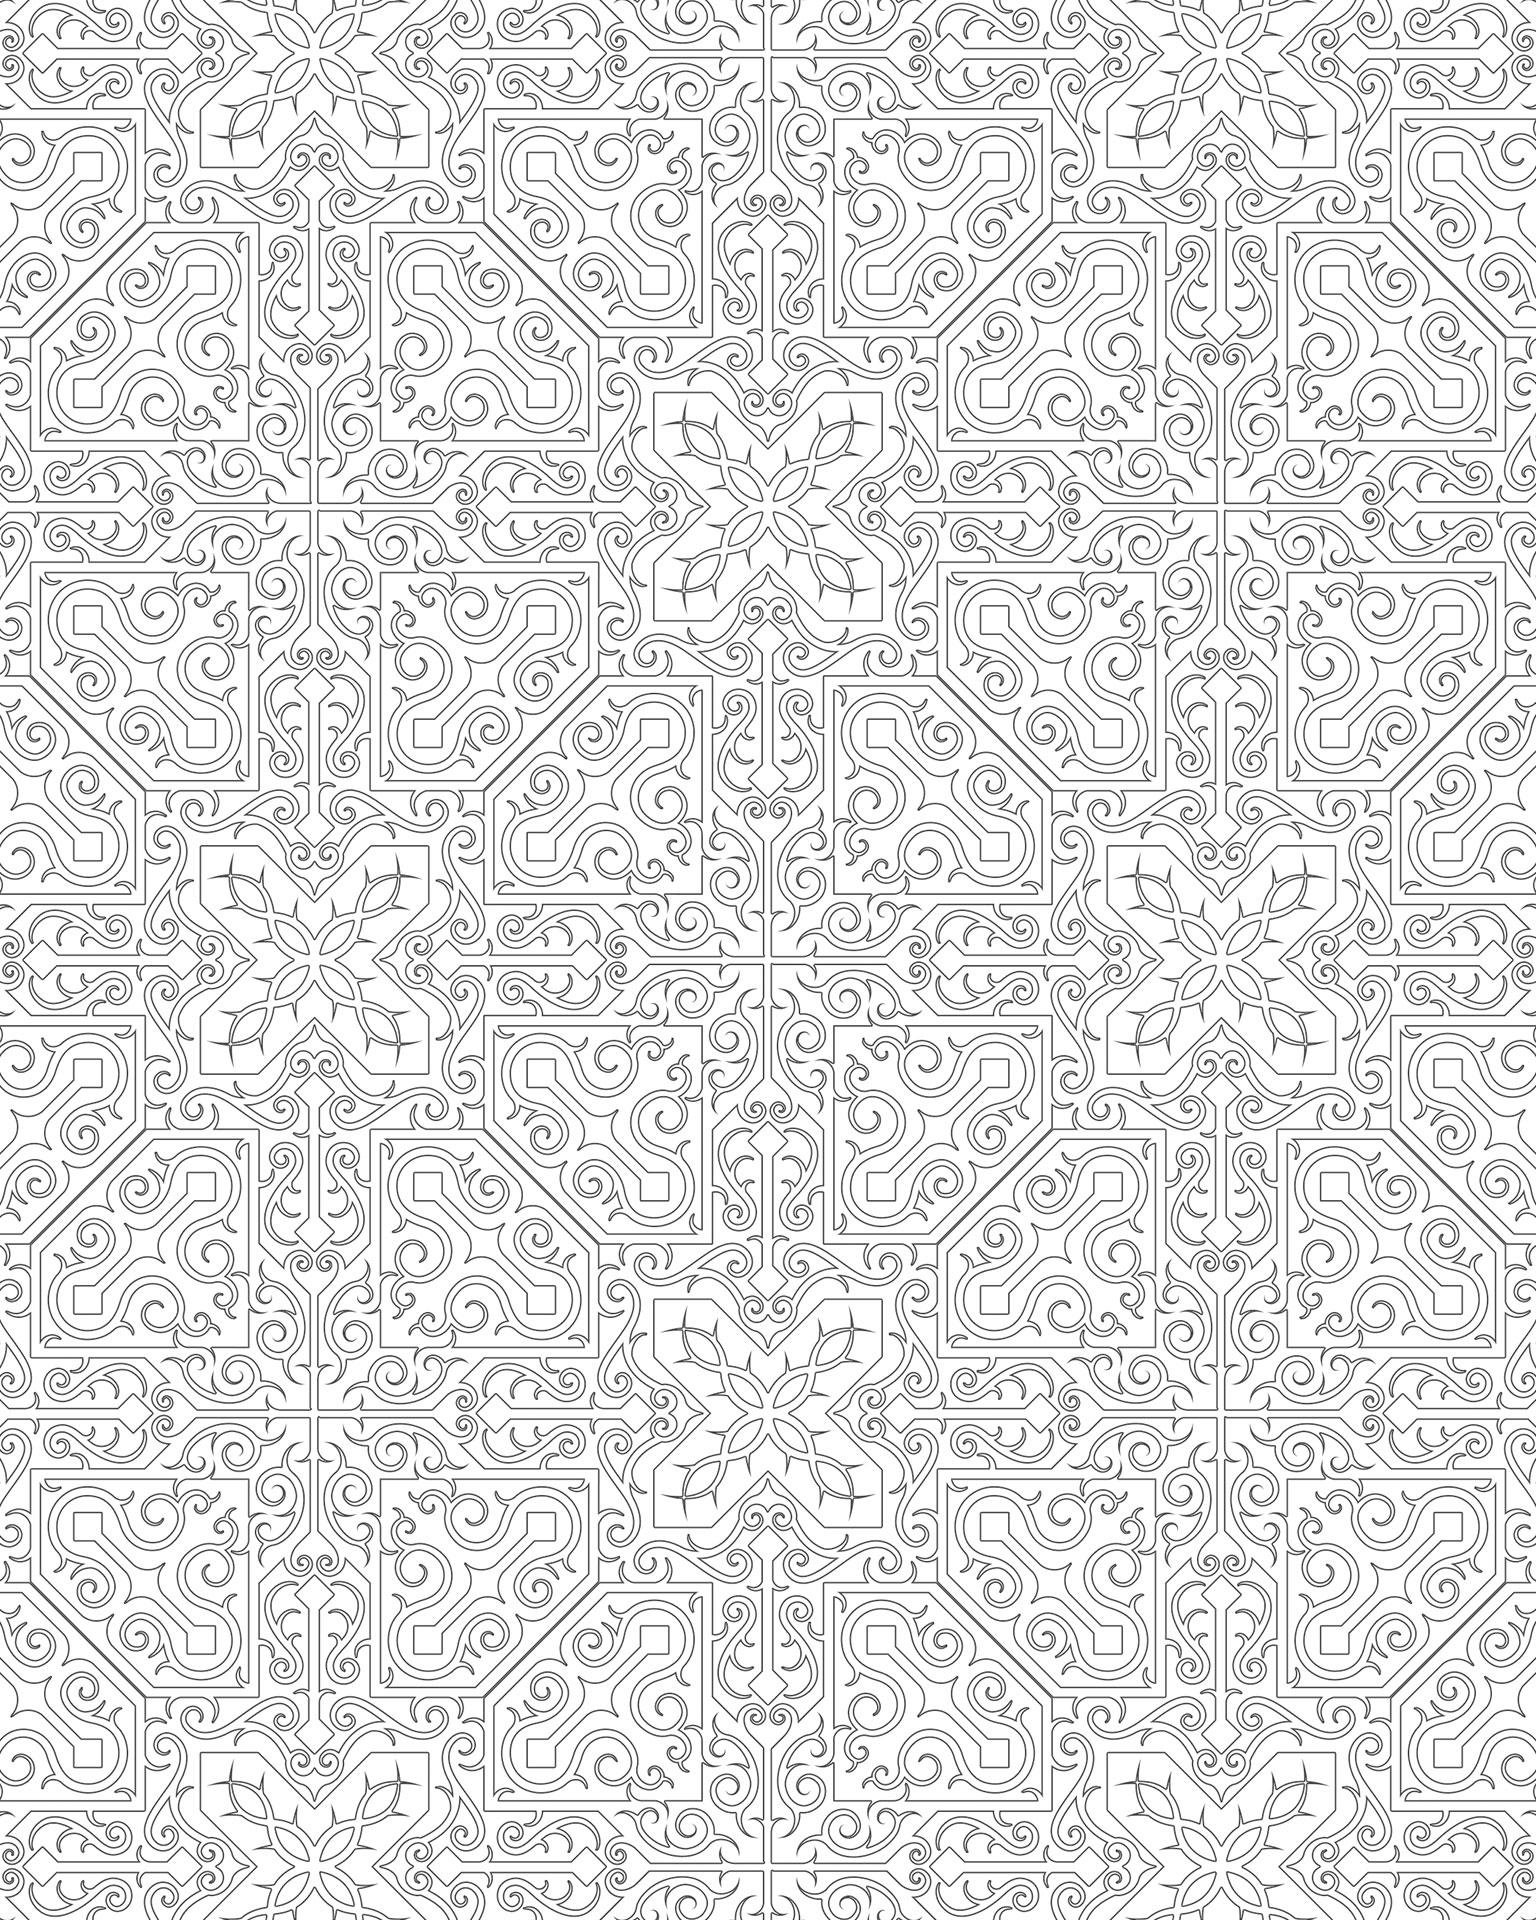 pattern-sacro.jpg